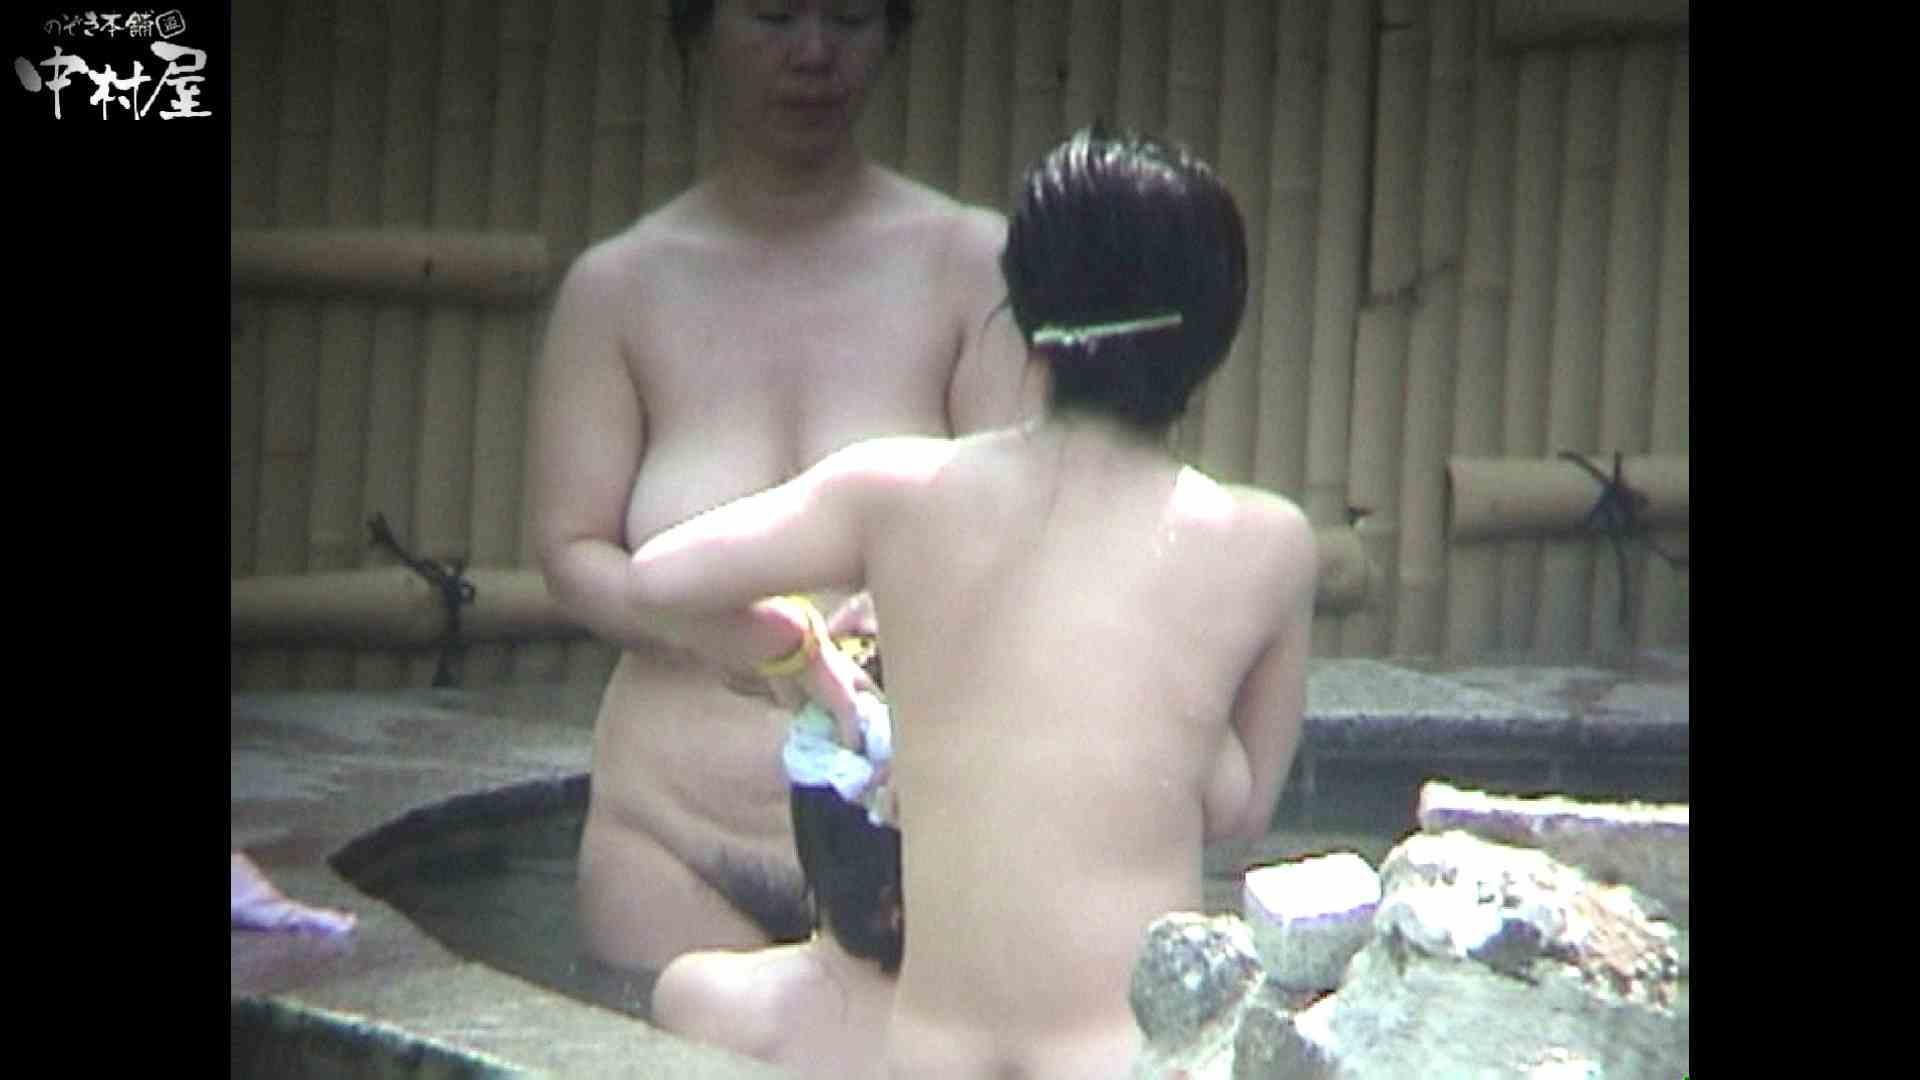 Aquaな露天風呂Vol.936 盗撮映像  110Pix 101